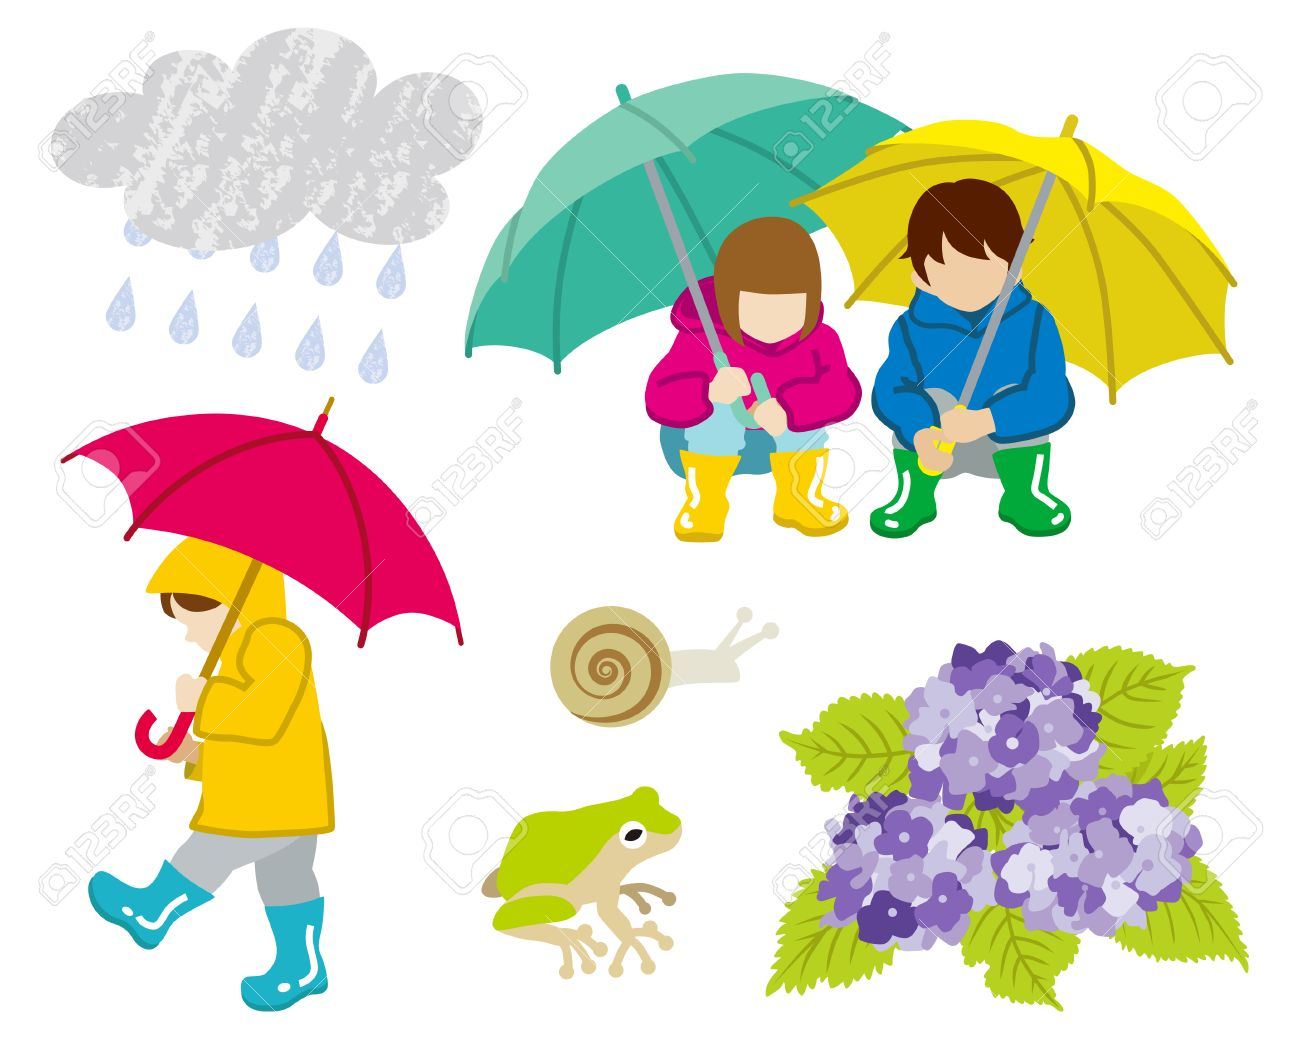 rainy day children clip art set royalty free cliparts vectors